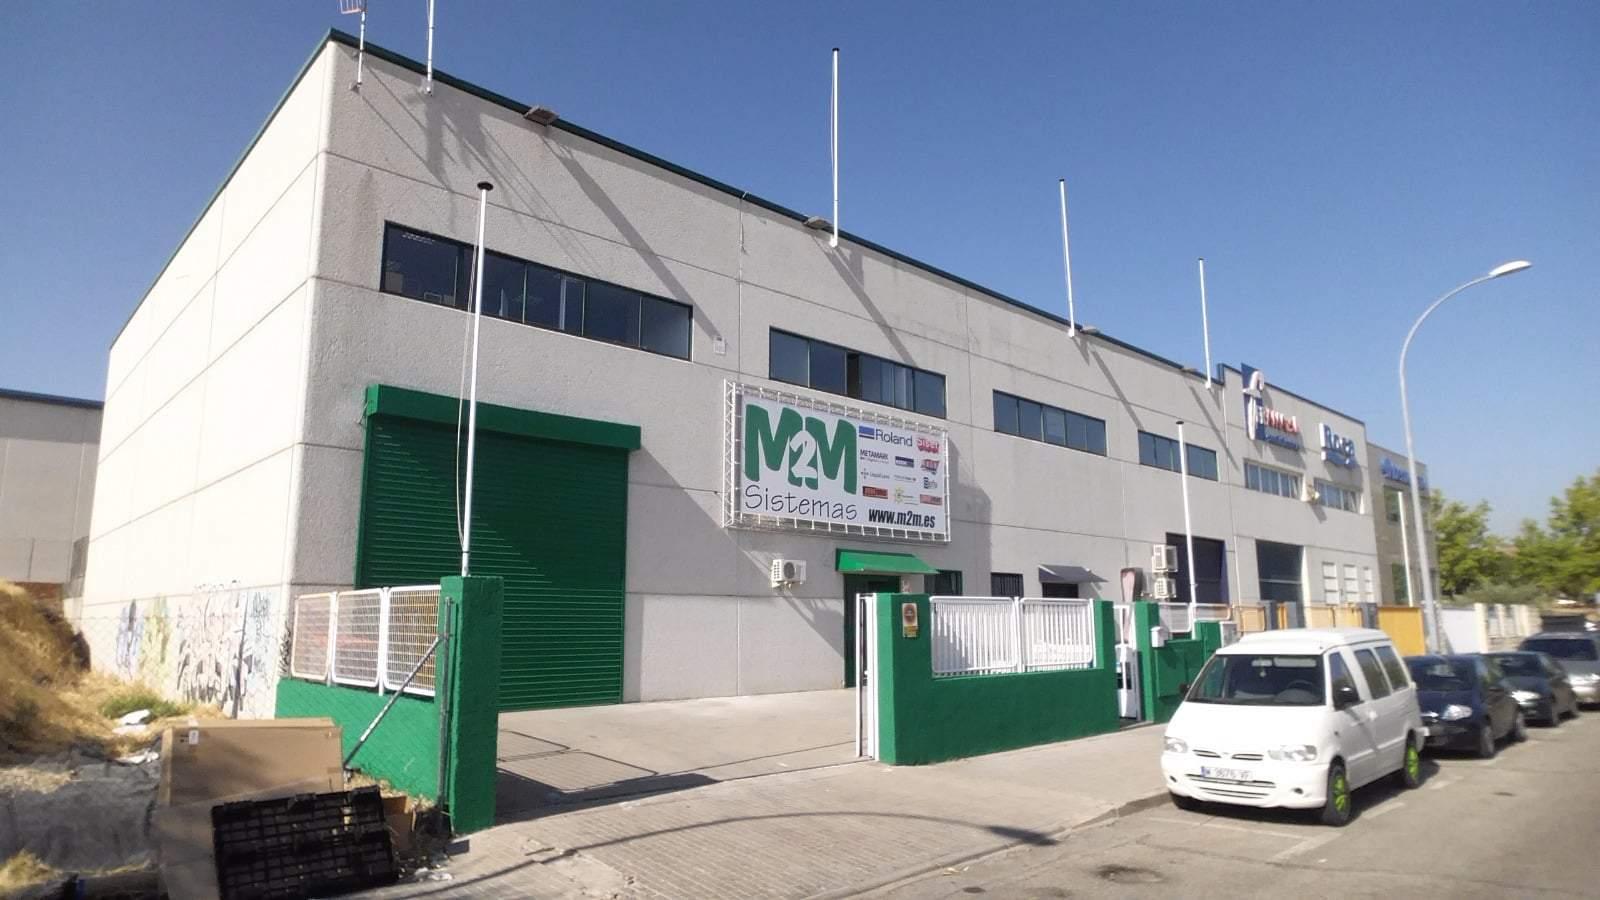 M2M Calle informatica 8